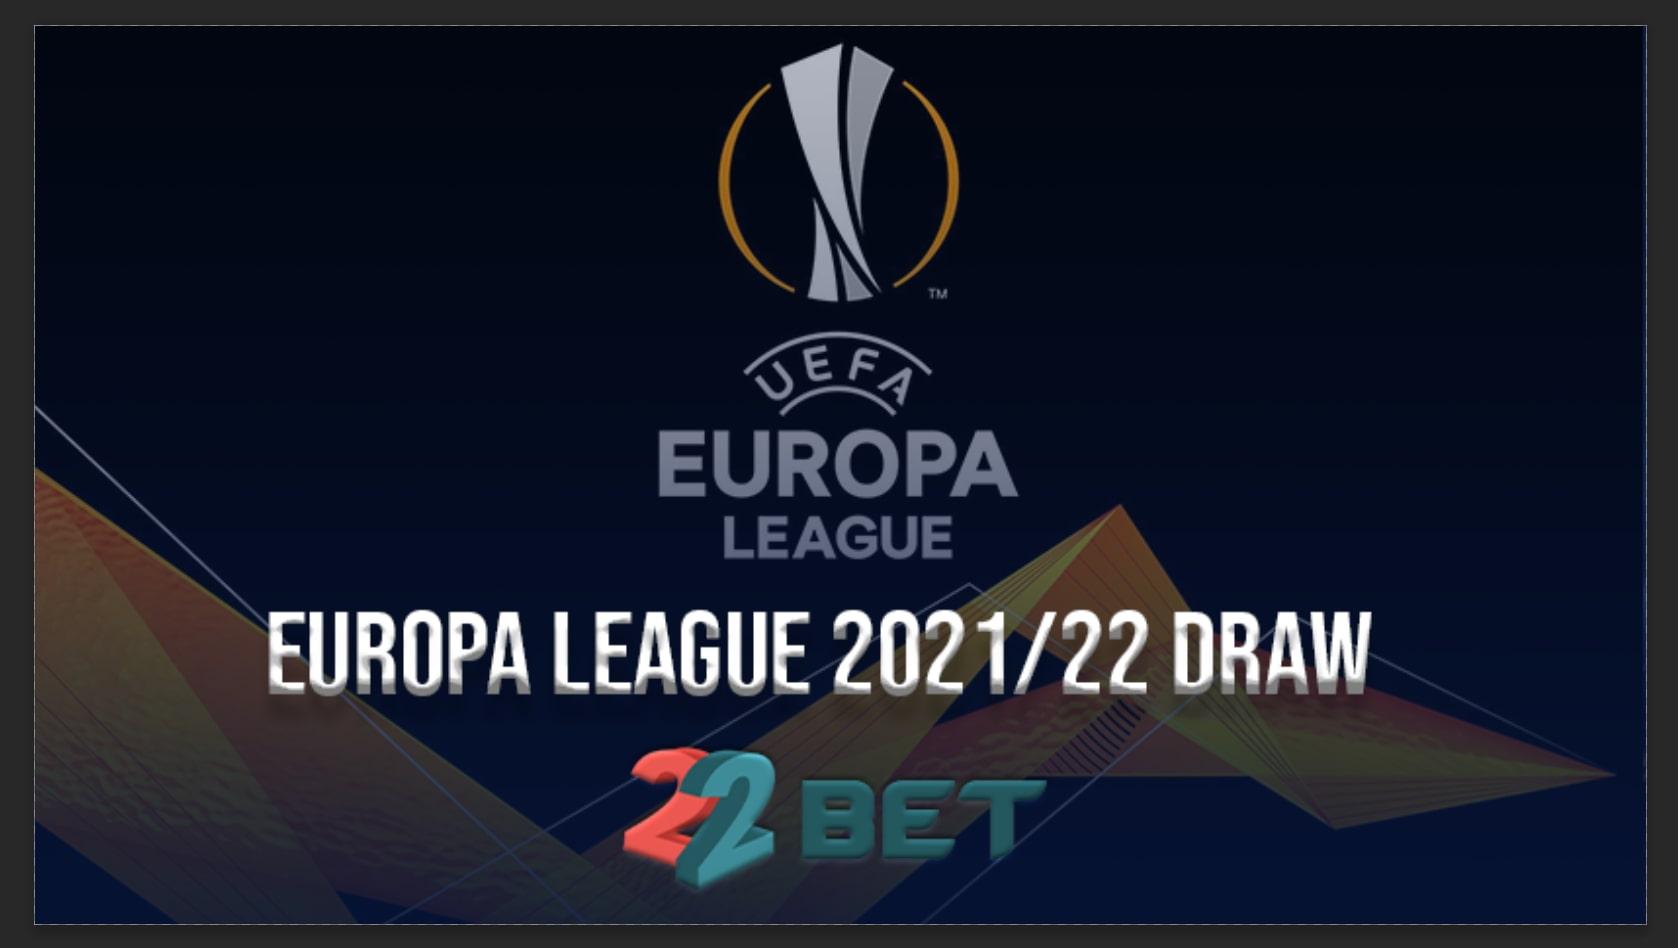 Europa League Third Qualifying Round Draw